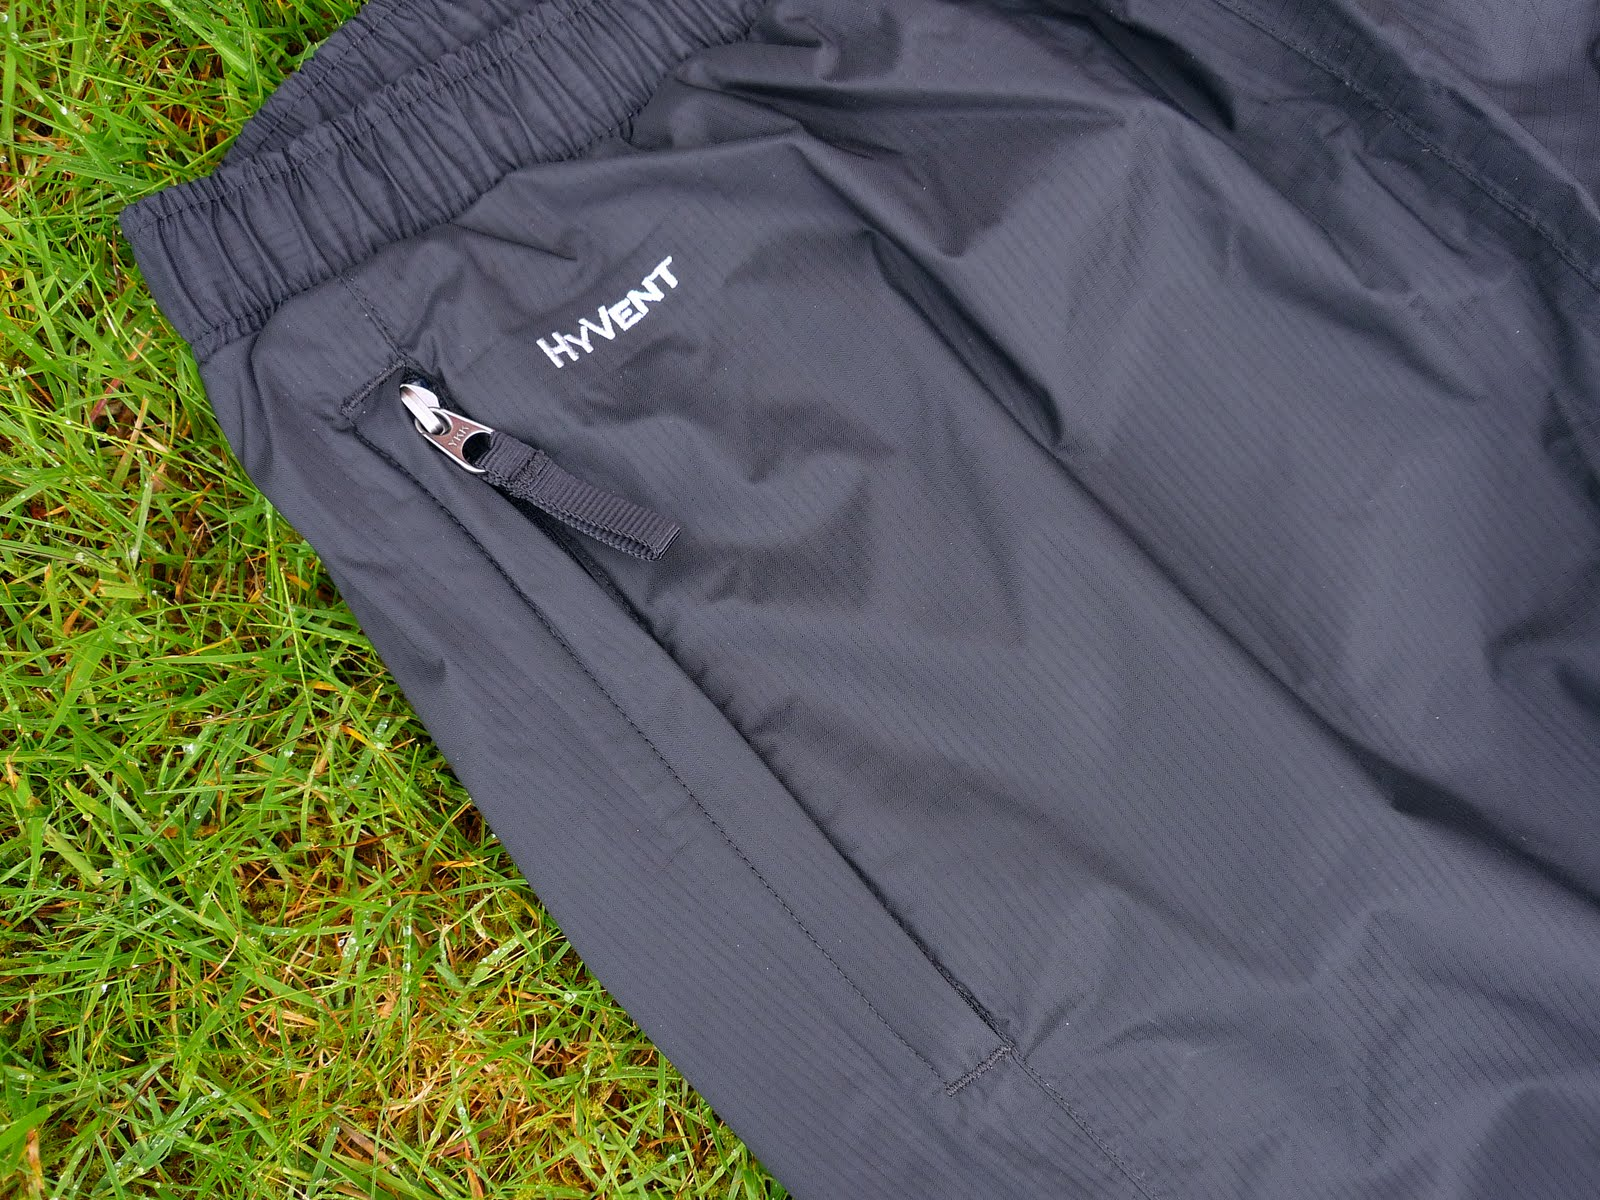 cff1a9205ca0 north face resolve pants men s - Marwood VeneerMarwood Veneer